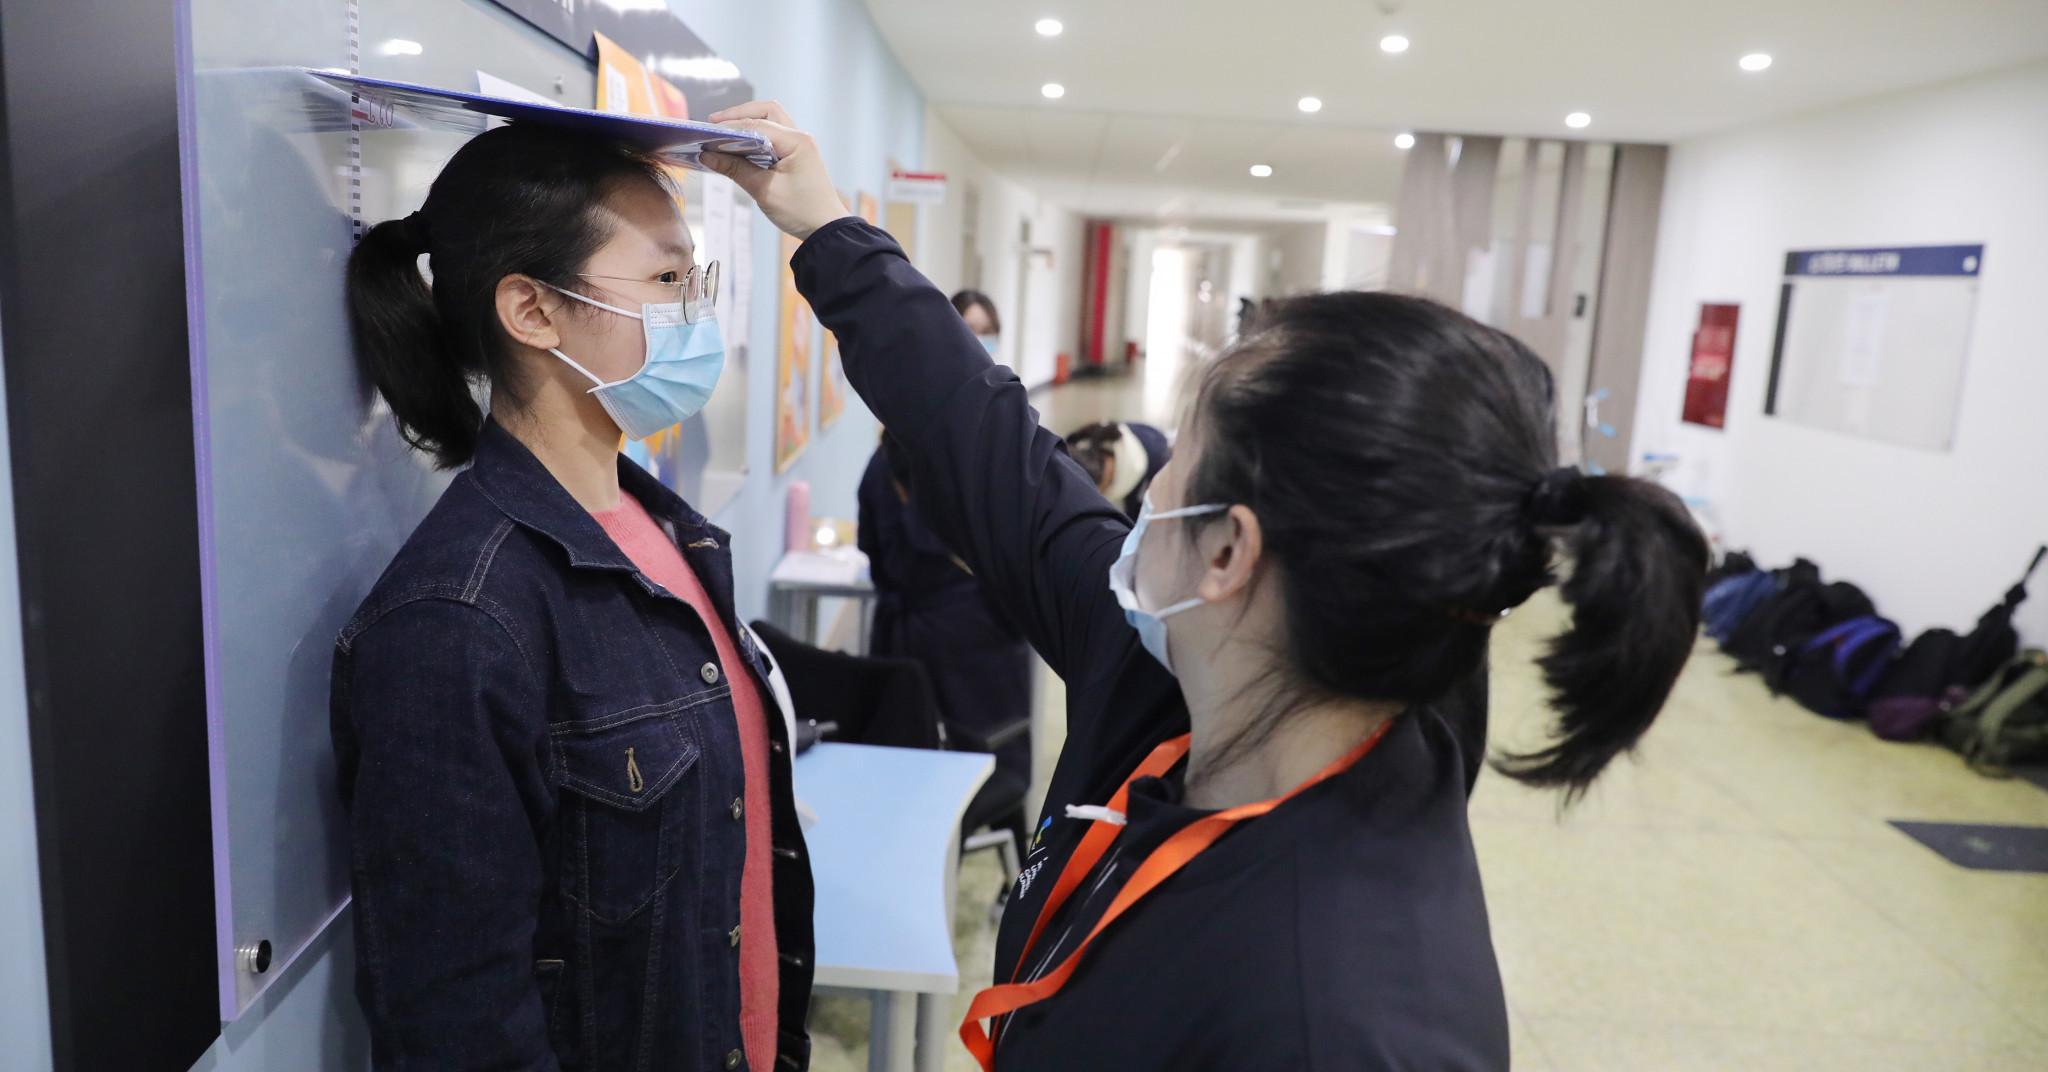 The height of potential ceremonies volunteers were measured ©Chengdu 2021